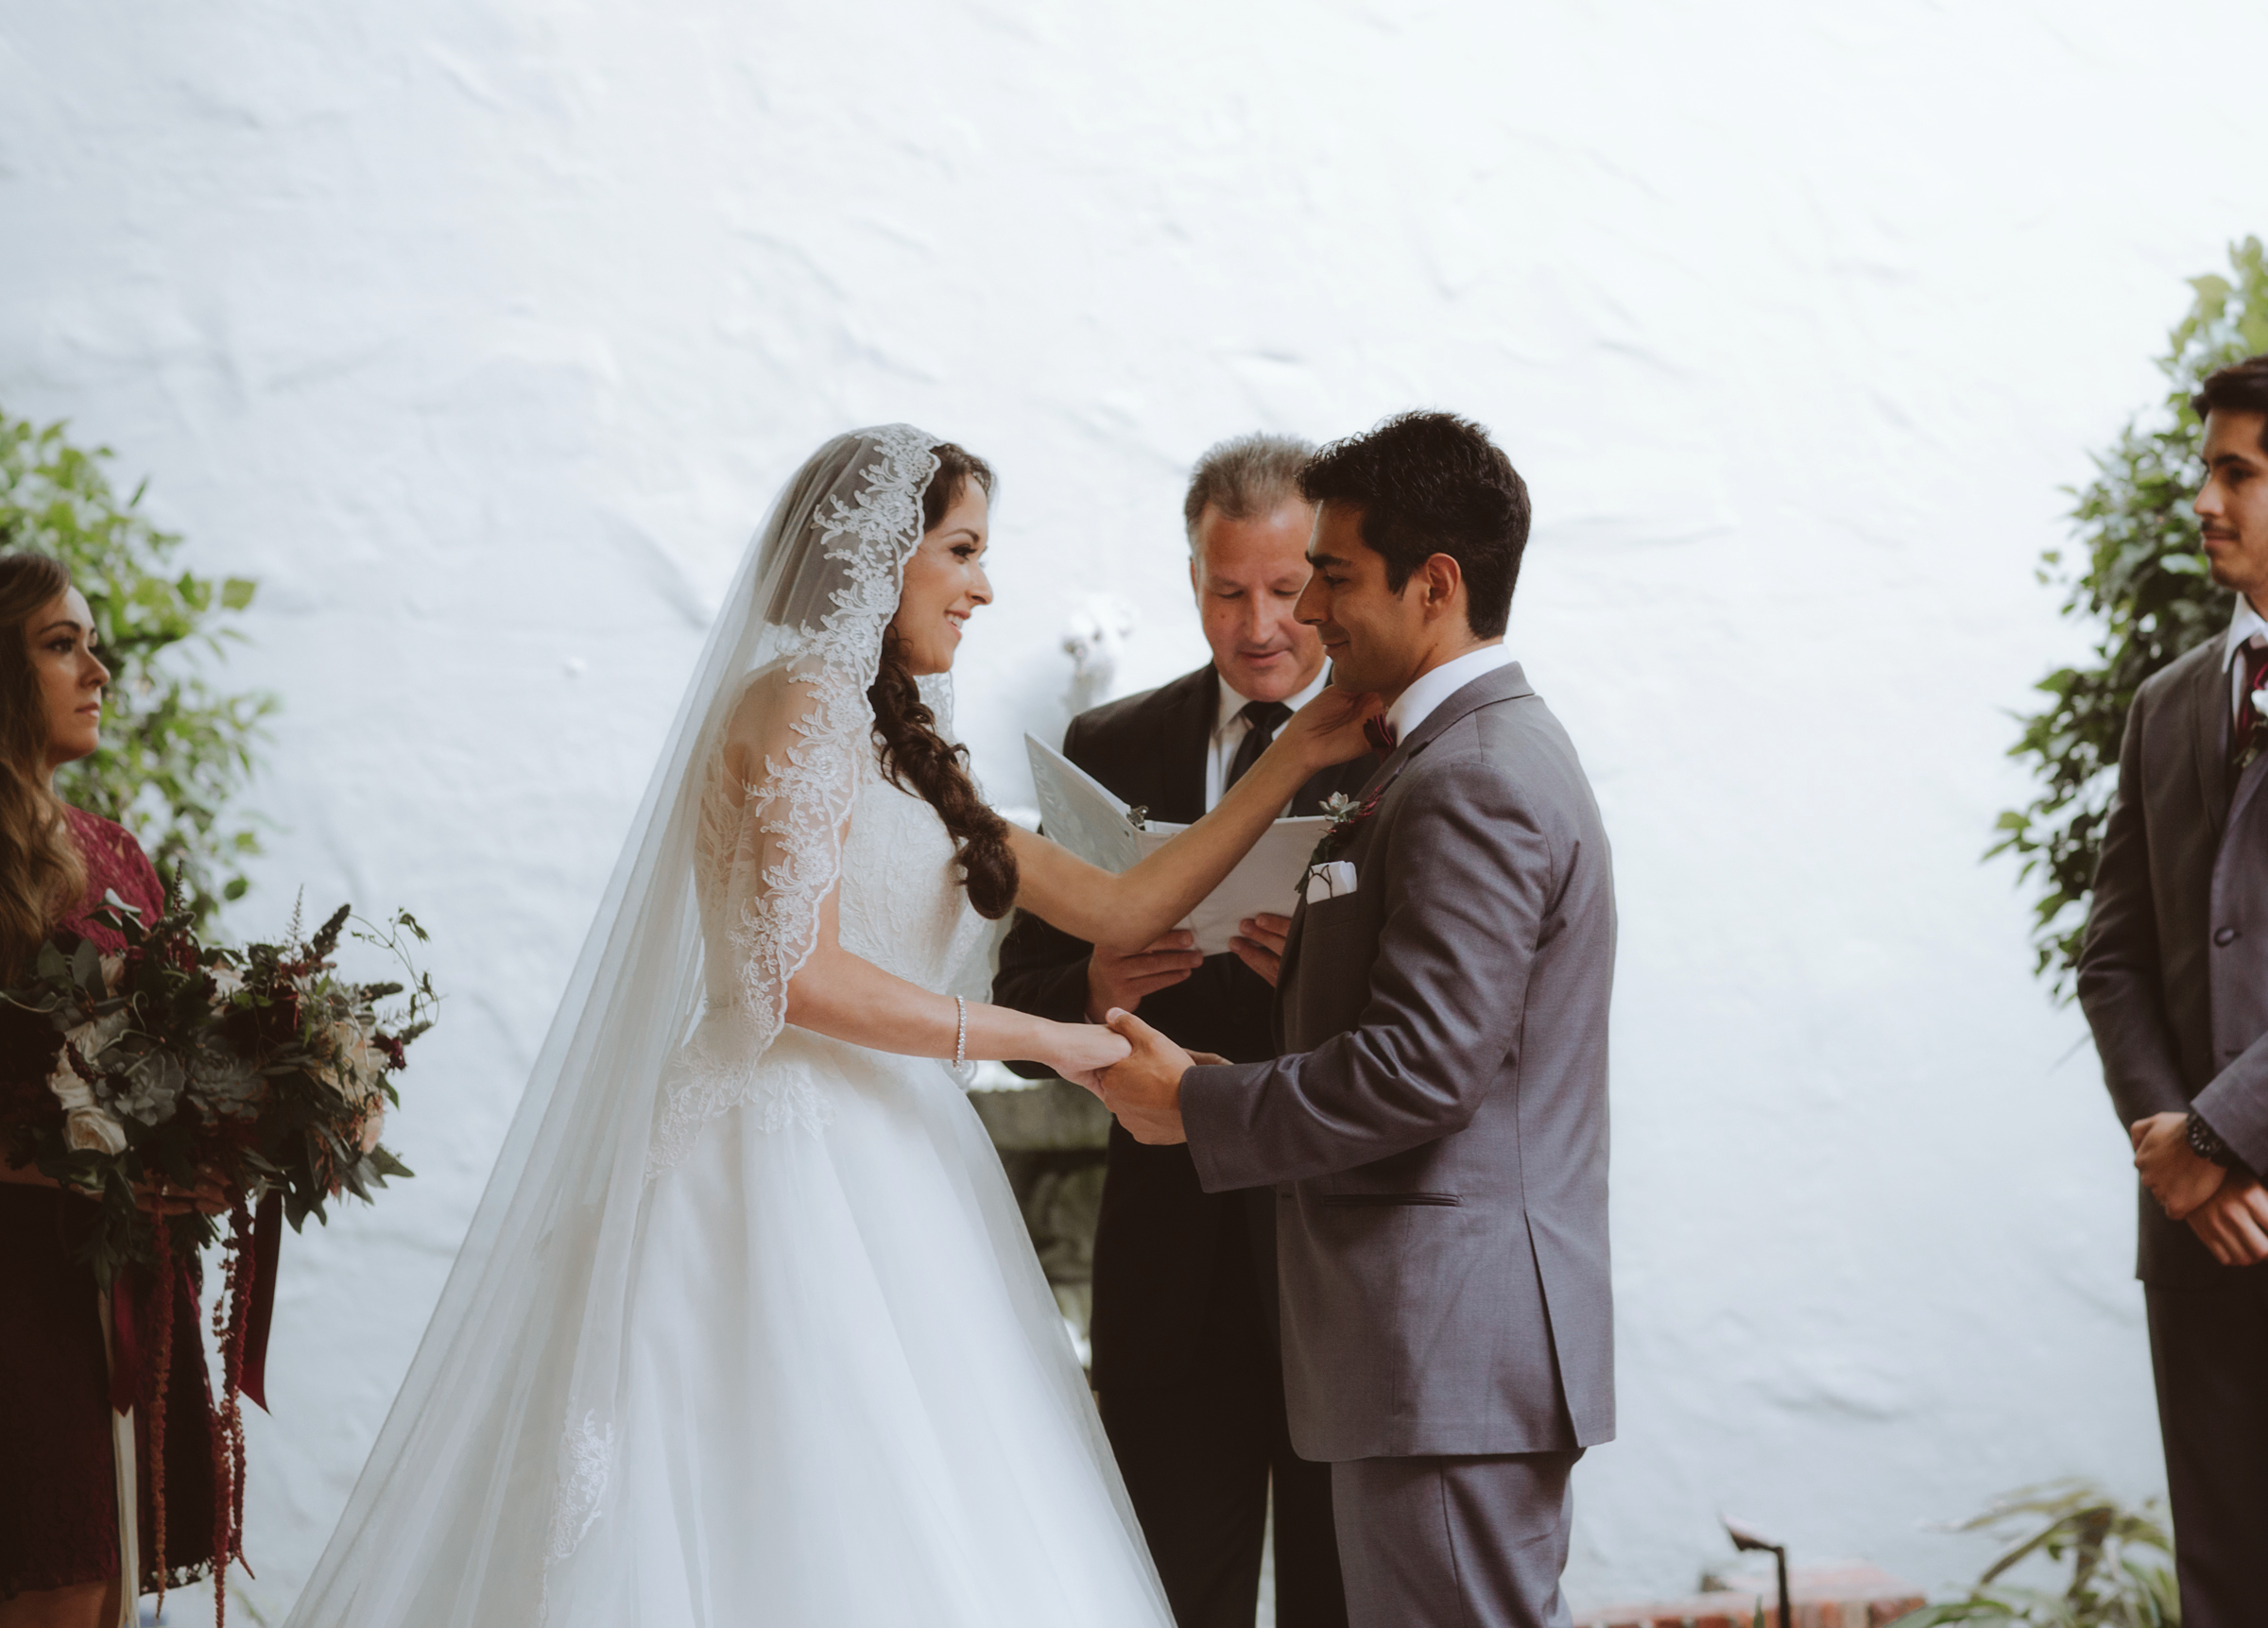 wedding day | MFA St Pete | Vanessa Boy Photography | vanessaboy.com-365.com |final.jpg